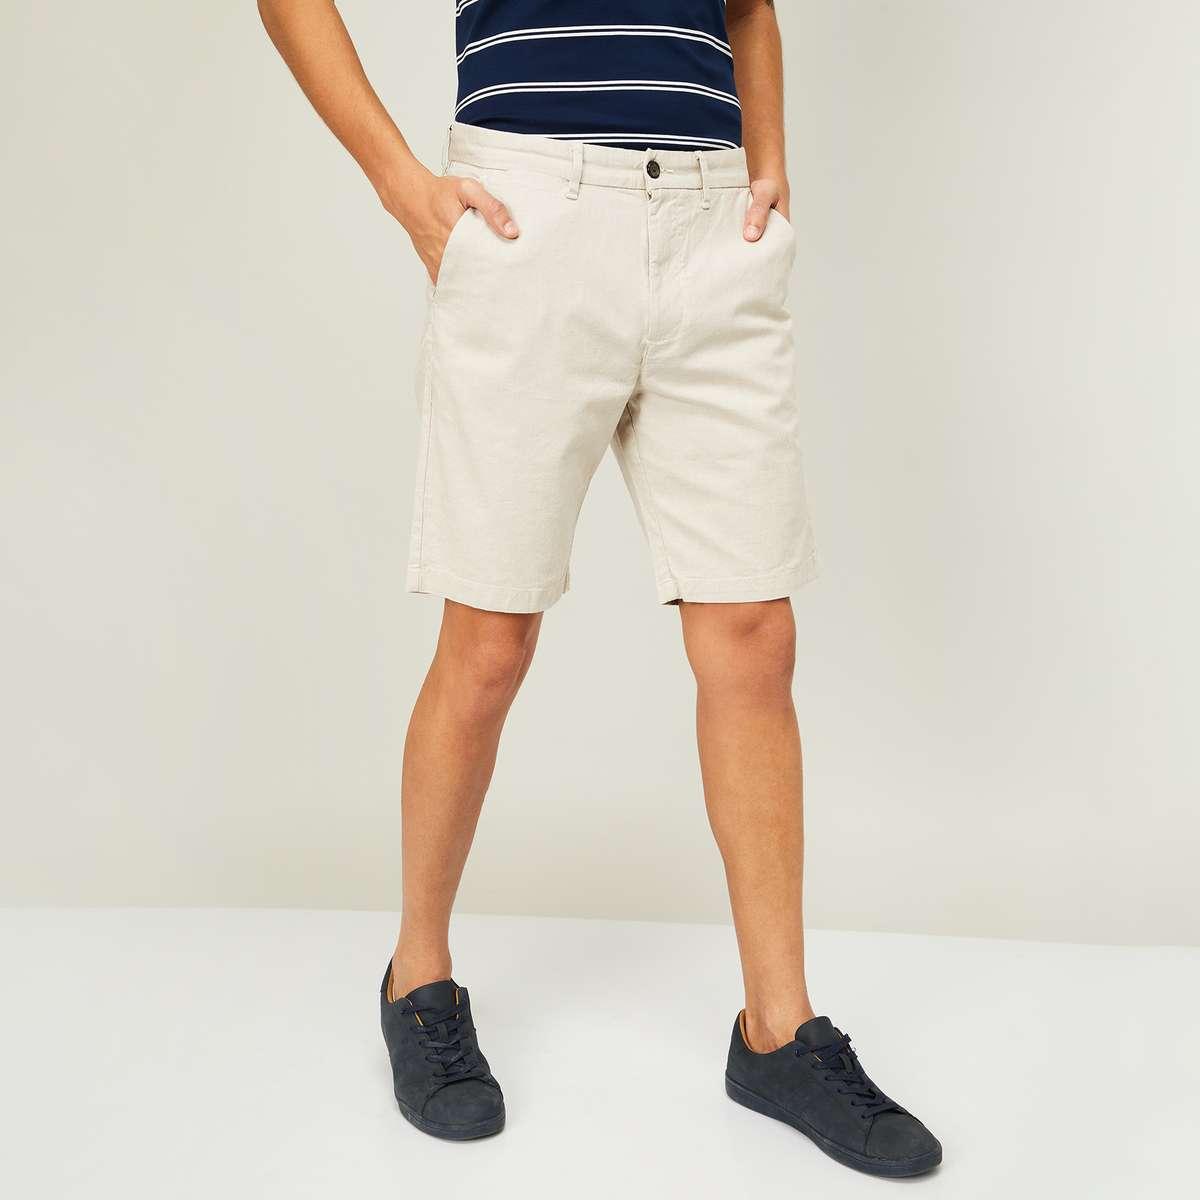 2.CODE Men Printed Woven Shorts